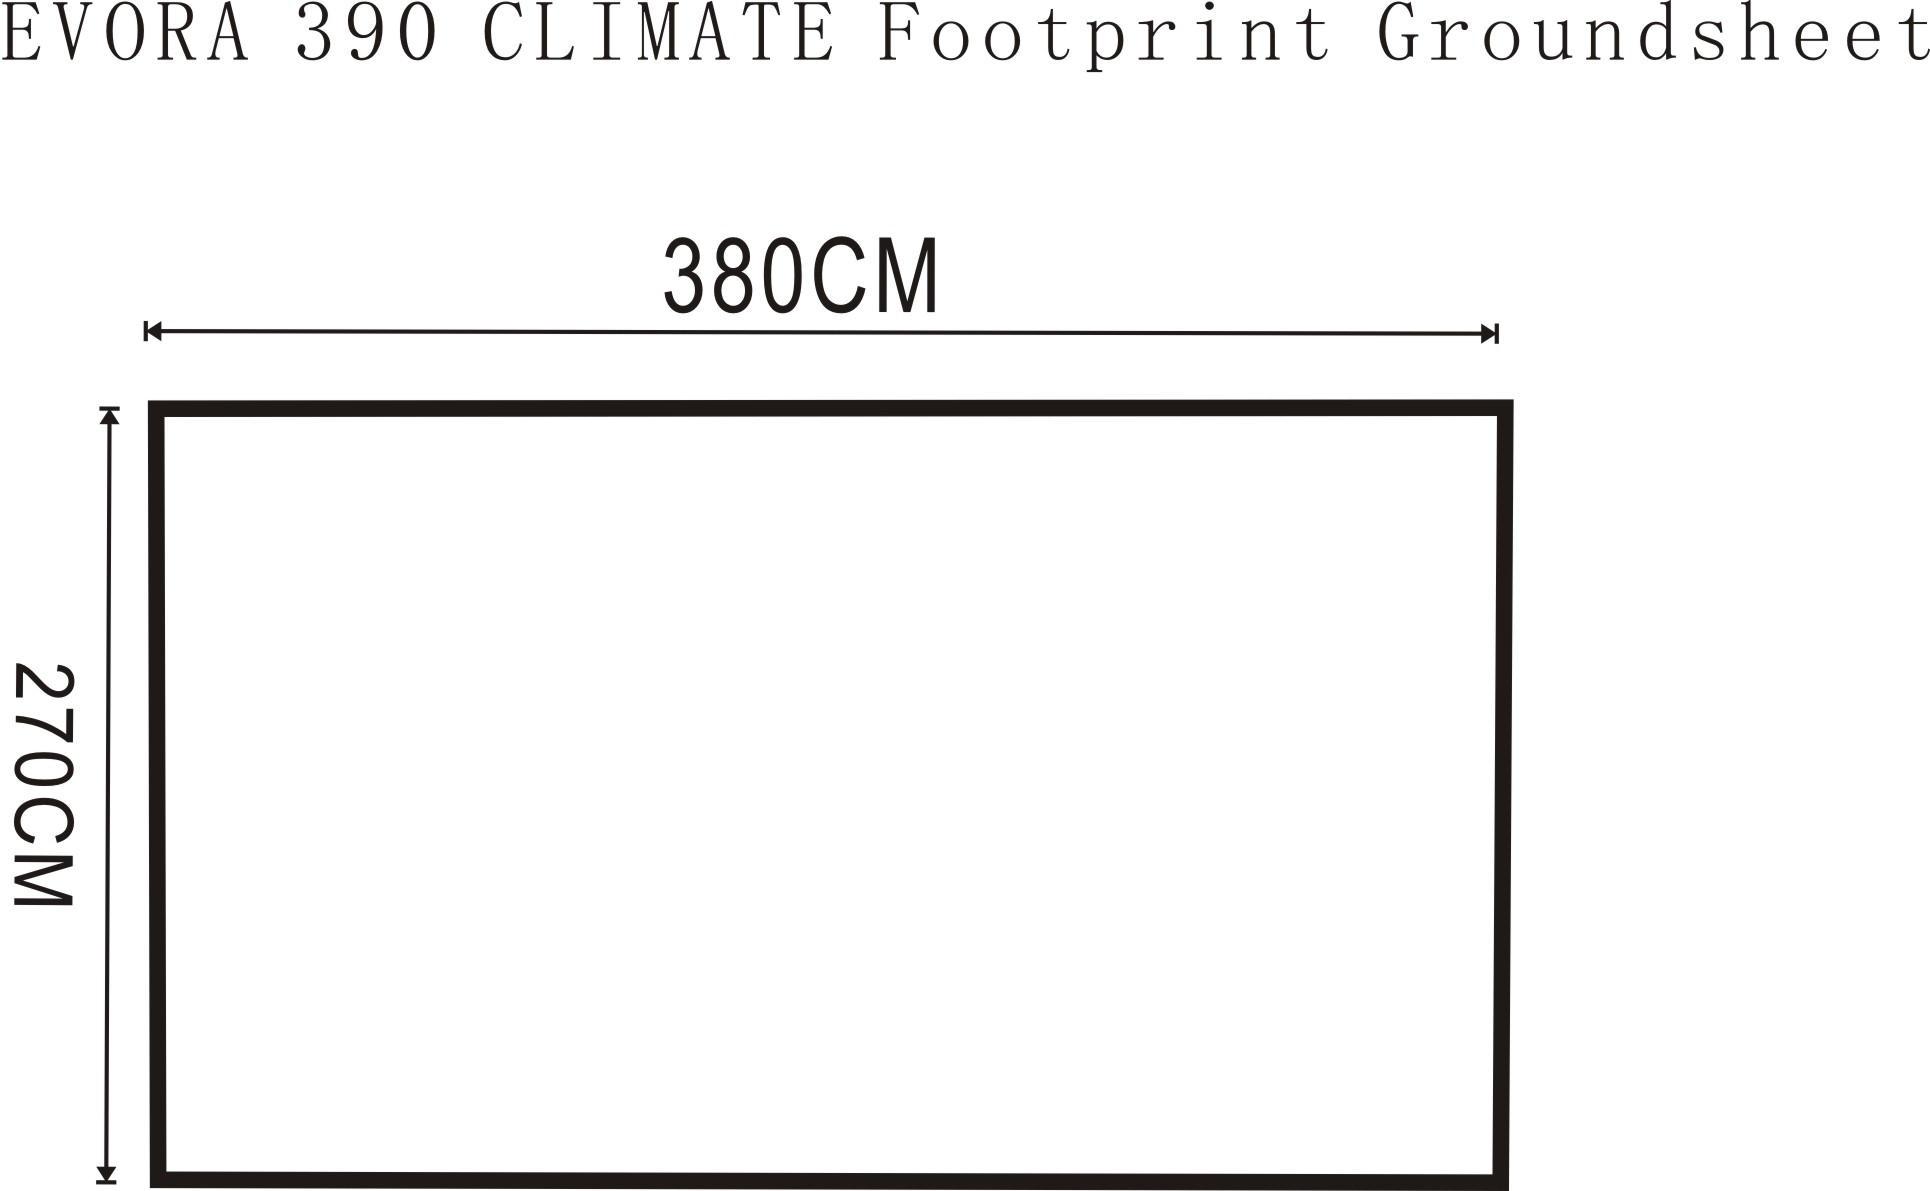 Outdoor Revolution Evora 390 Pro Climate Footprint